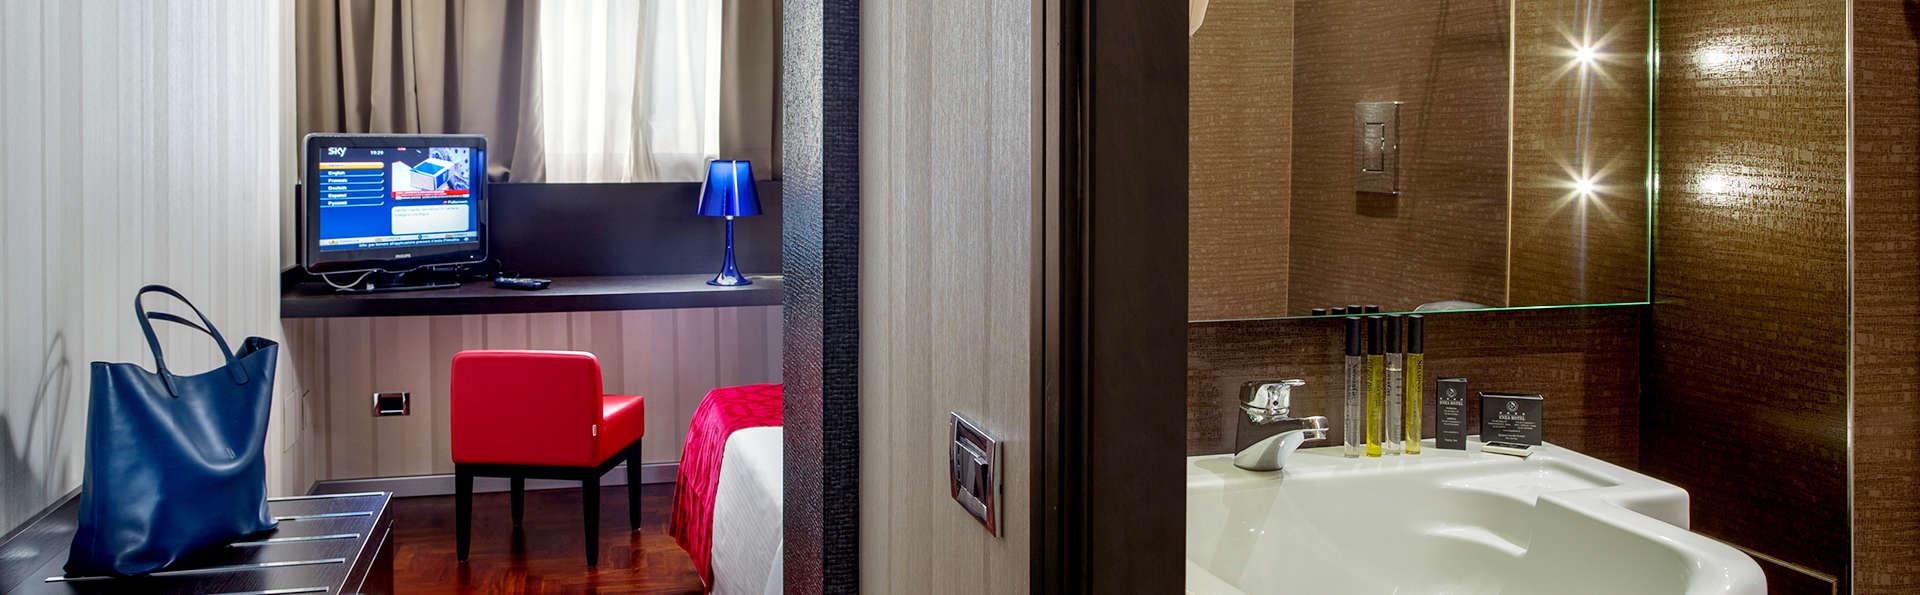 Enea Hotel - Edit_RoomBath.jpg